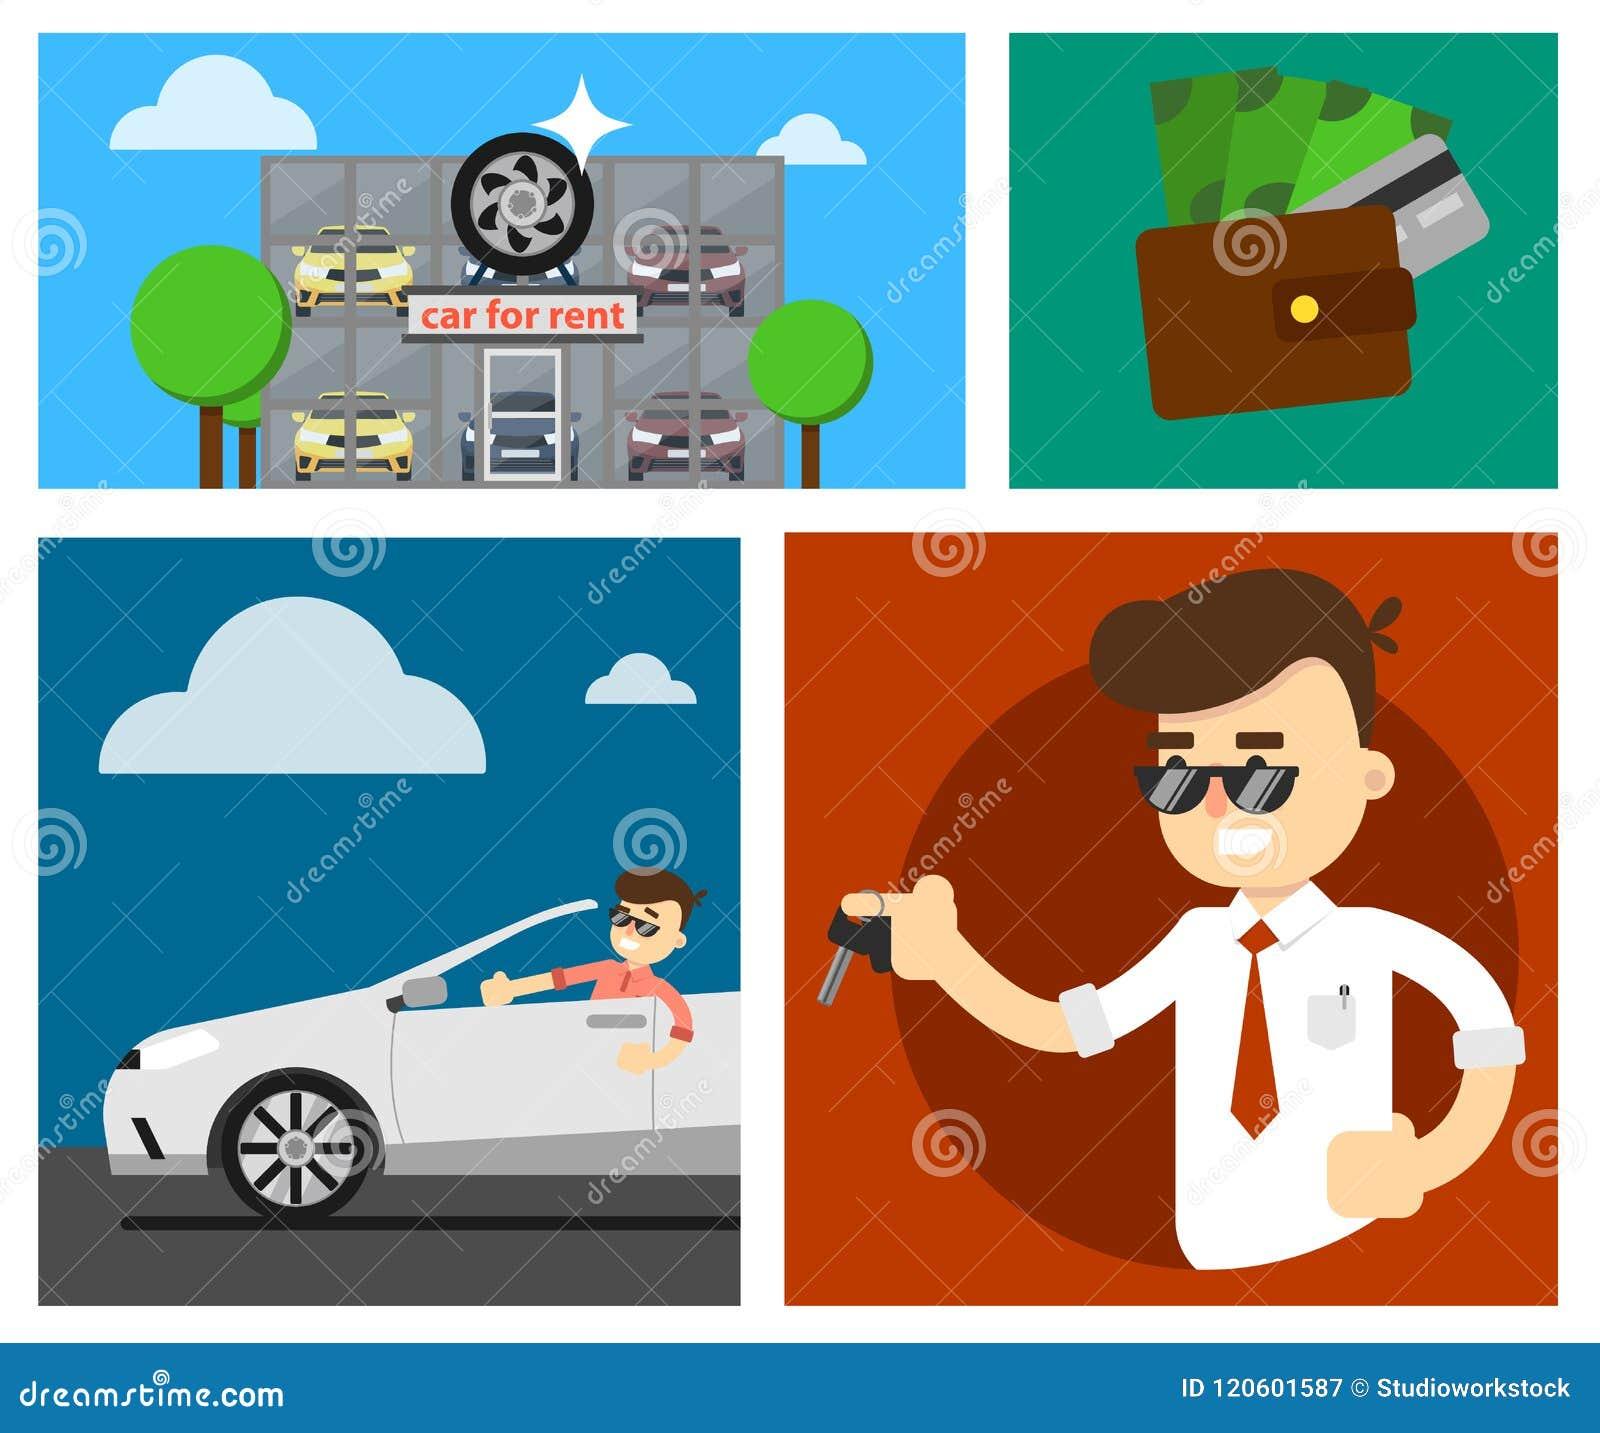 Rental Car Banners Stock Illustration Illustration Of Hire 120601587